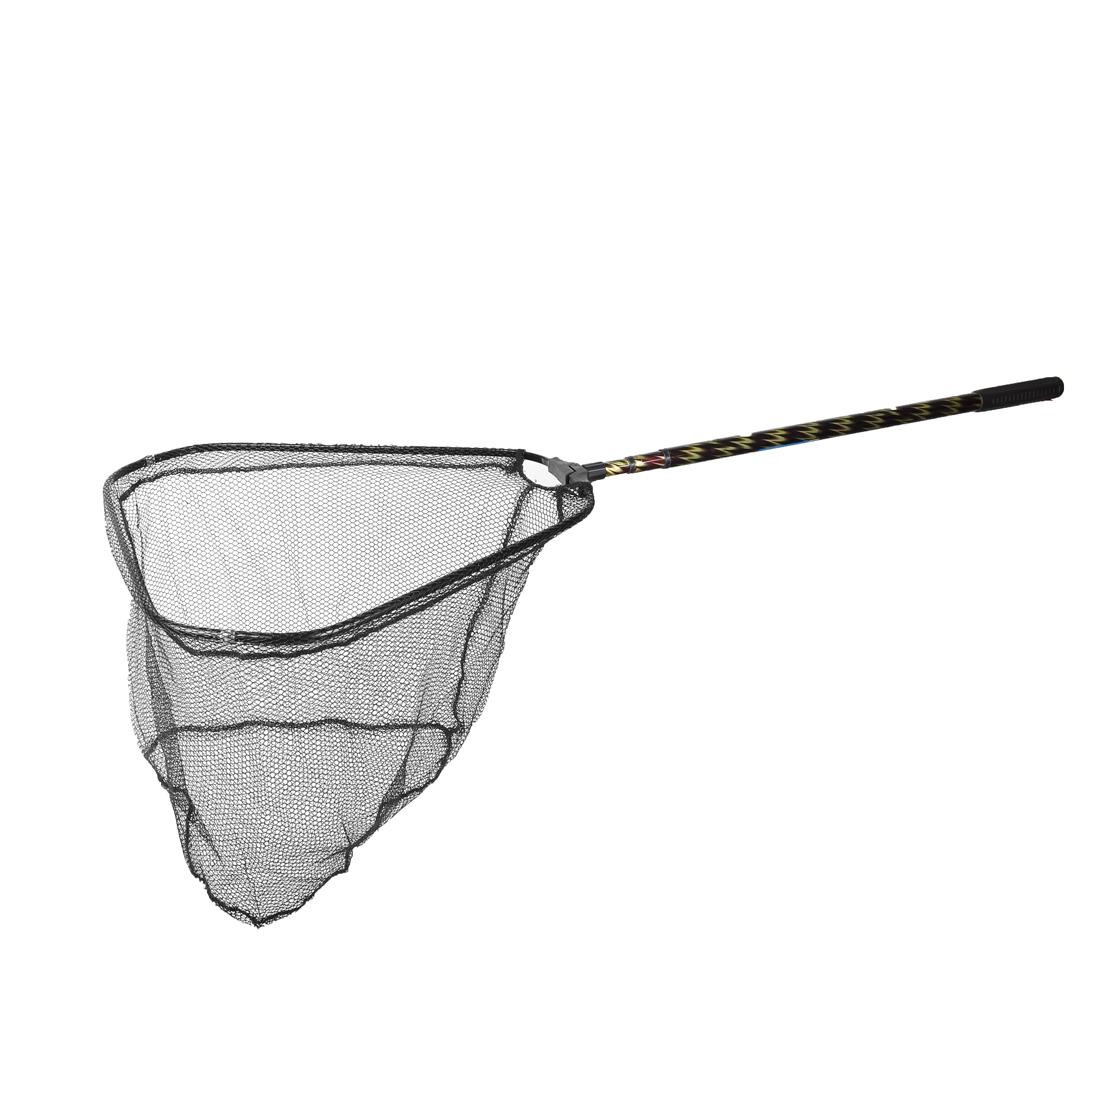 4.6Ft Telescopic Plastic Handle Army Green Mesh Triangle Fishing Landing Net